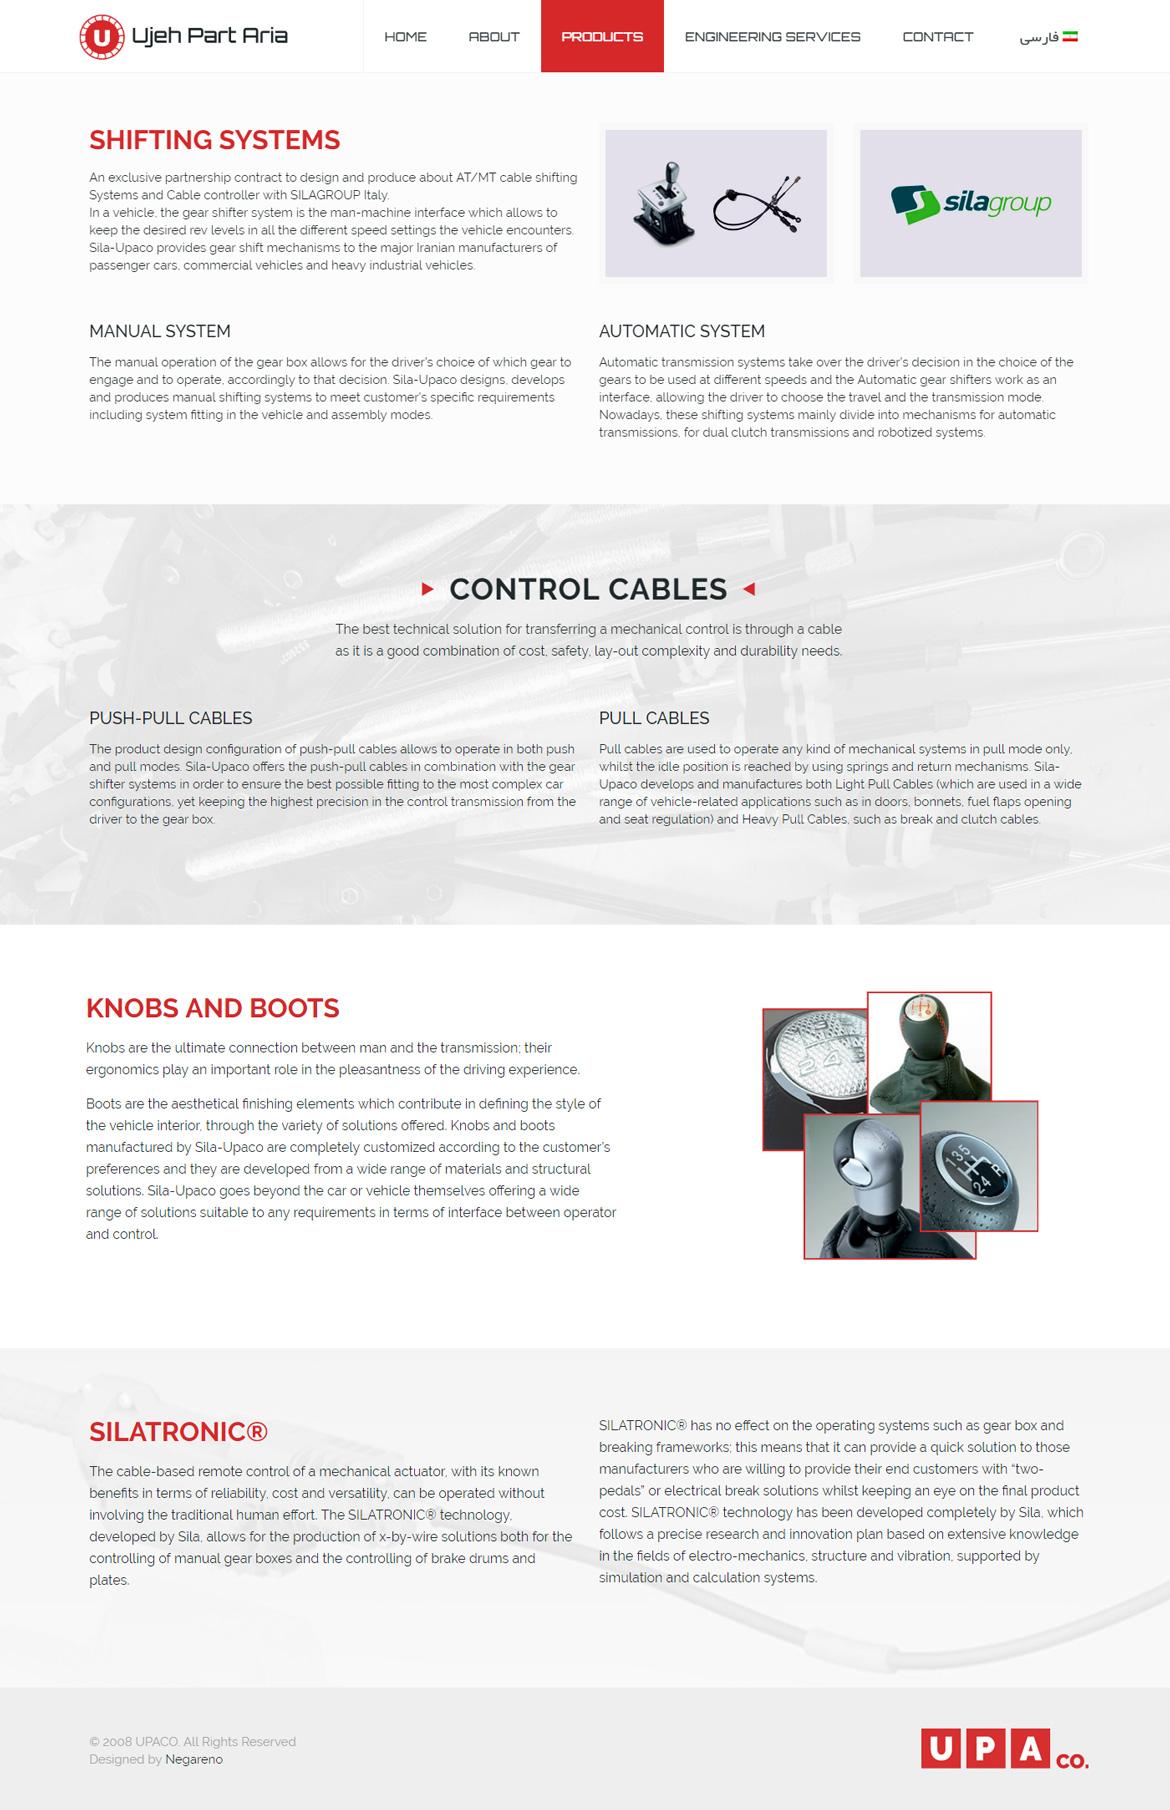 طراحی سایت یوپاکو